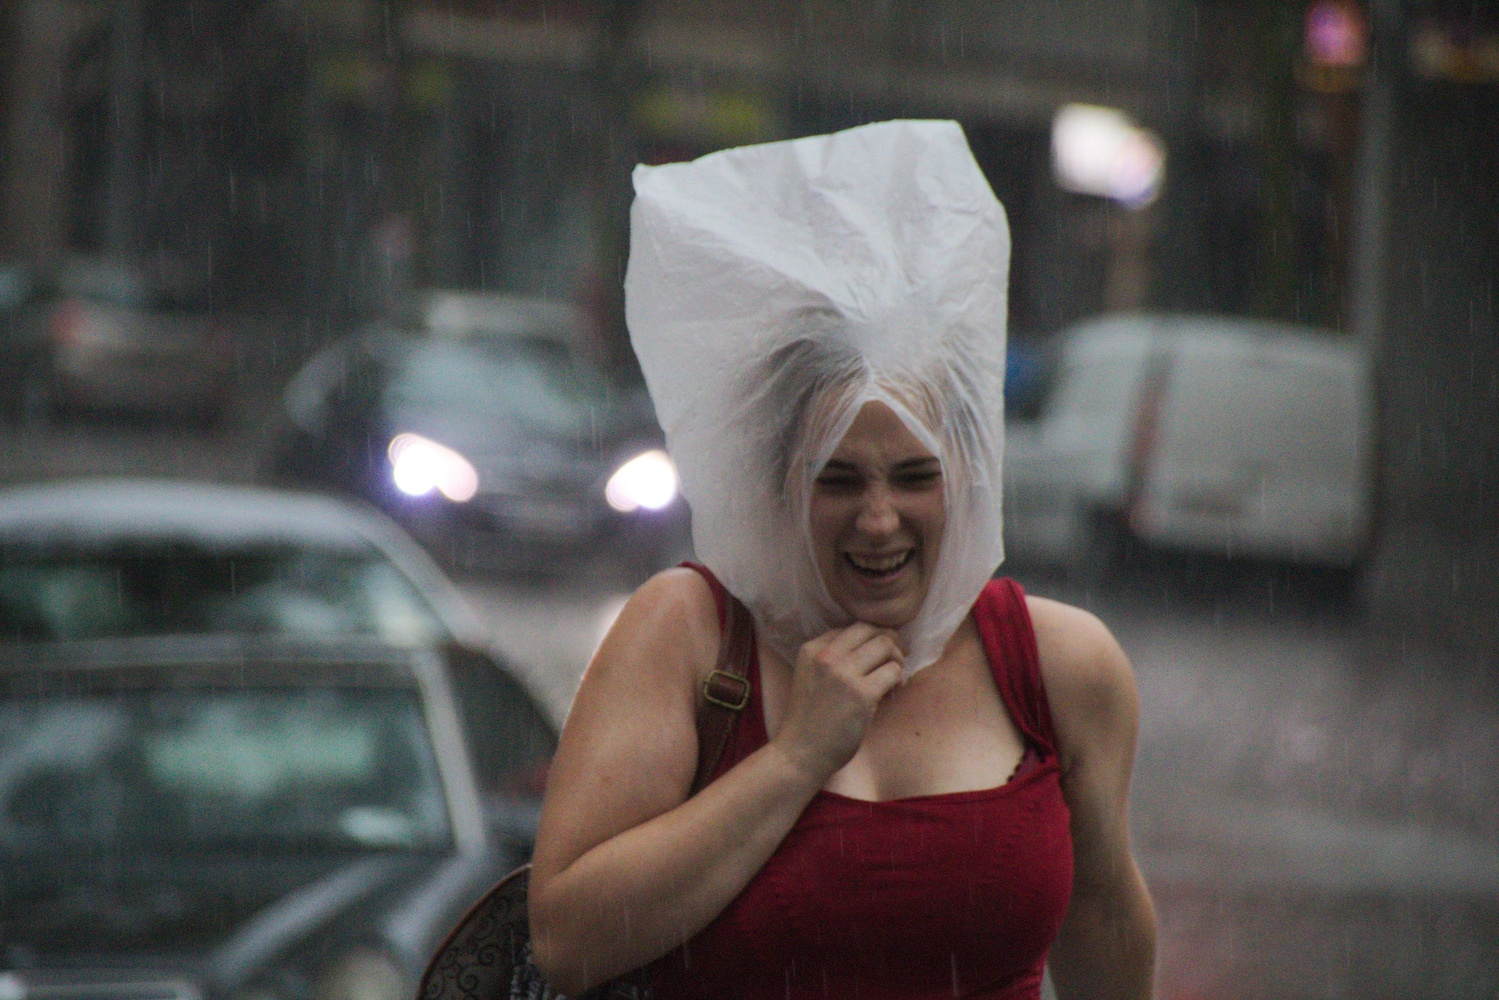 Heavy rain by Alex Sokolovs